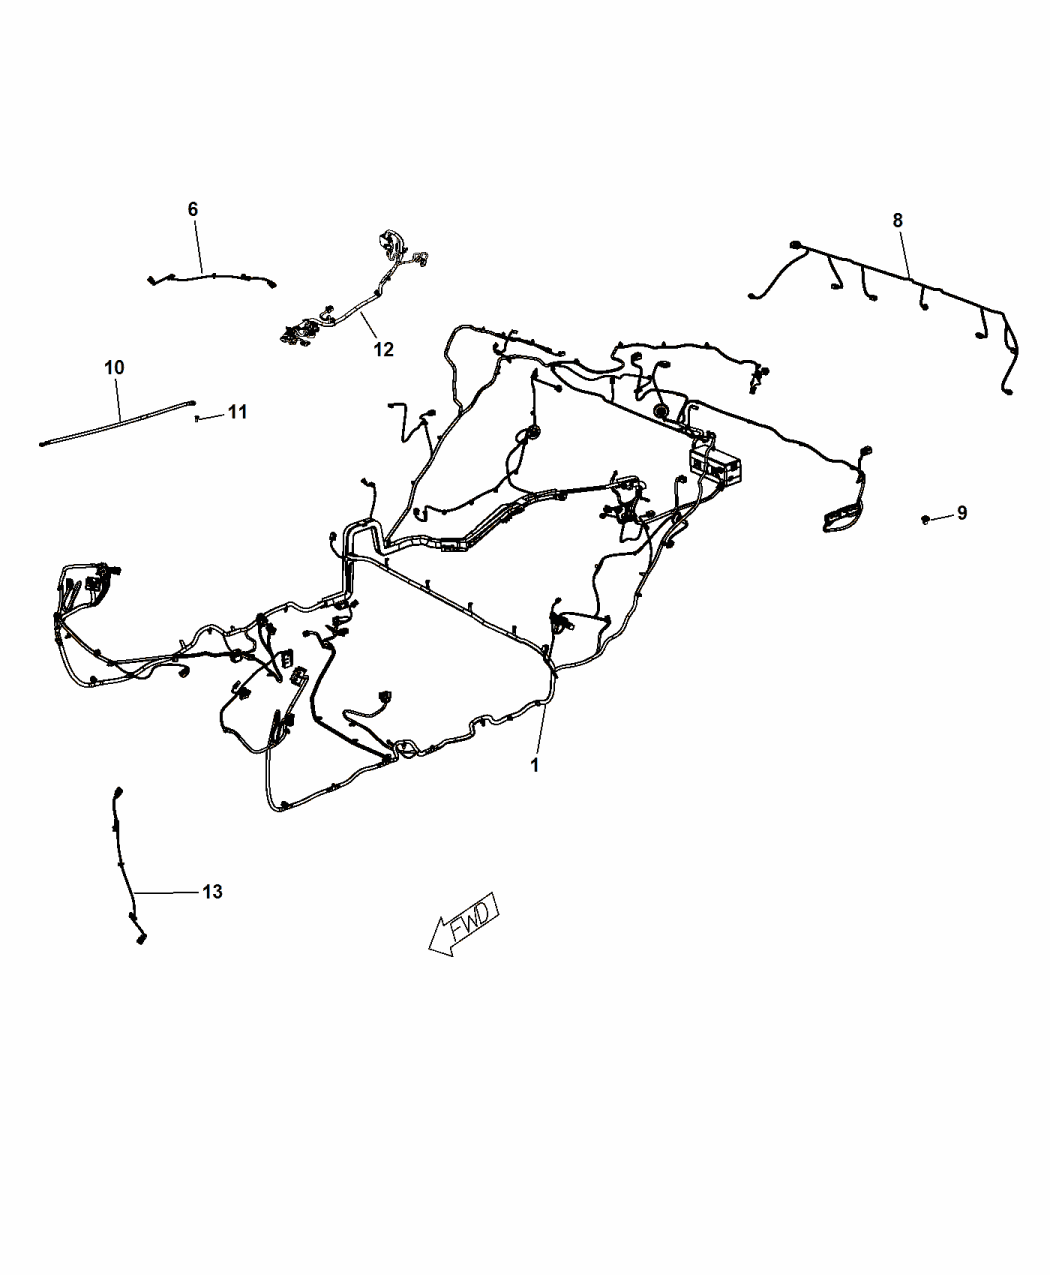 [SCHEMATICS_48IU]  CN_4359] Dodge Challenger Wiring Harness Download Diagram | Challenger Wiring Diagram |  | Lious Taliz Lous Jebrp Mohammedshrine Librar Wiring 101